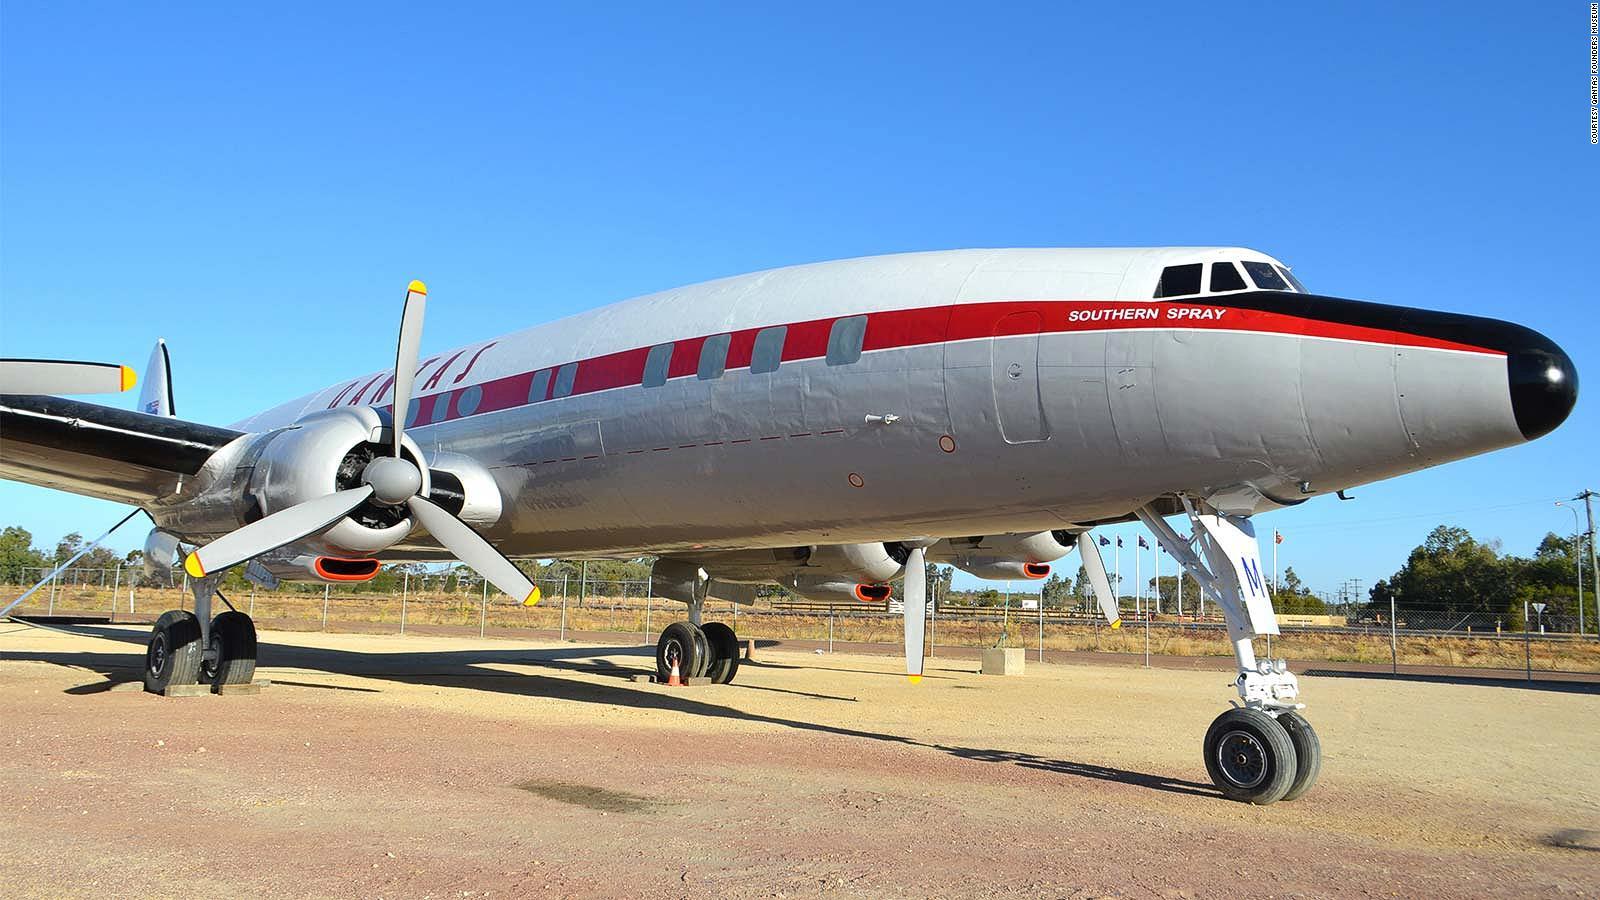 Qantas Super Constellation airliner from 1950s is restored   CNN Travel